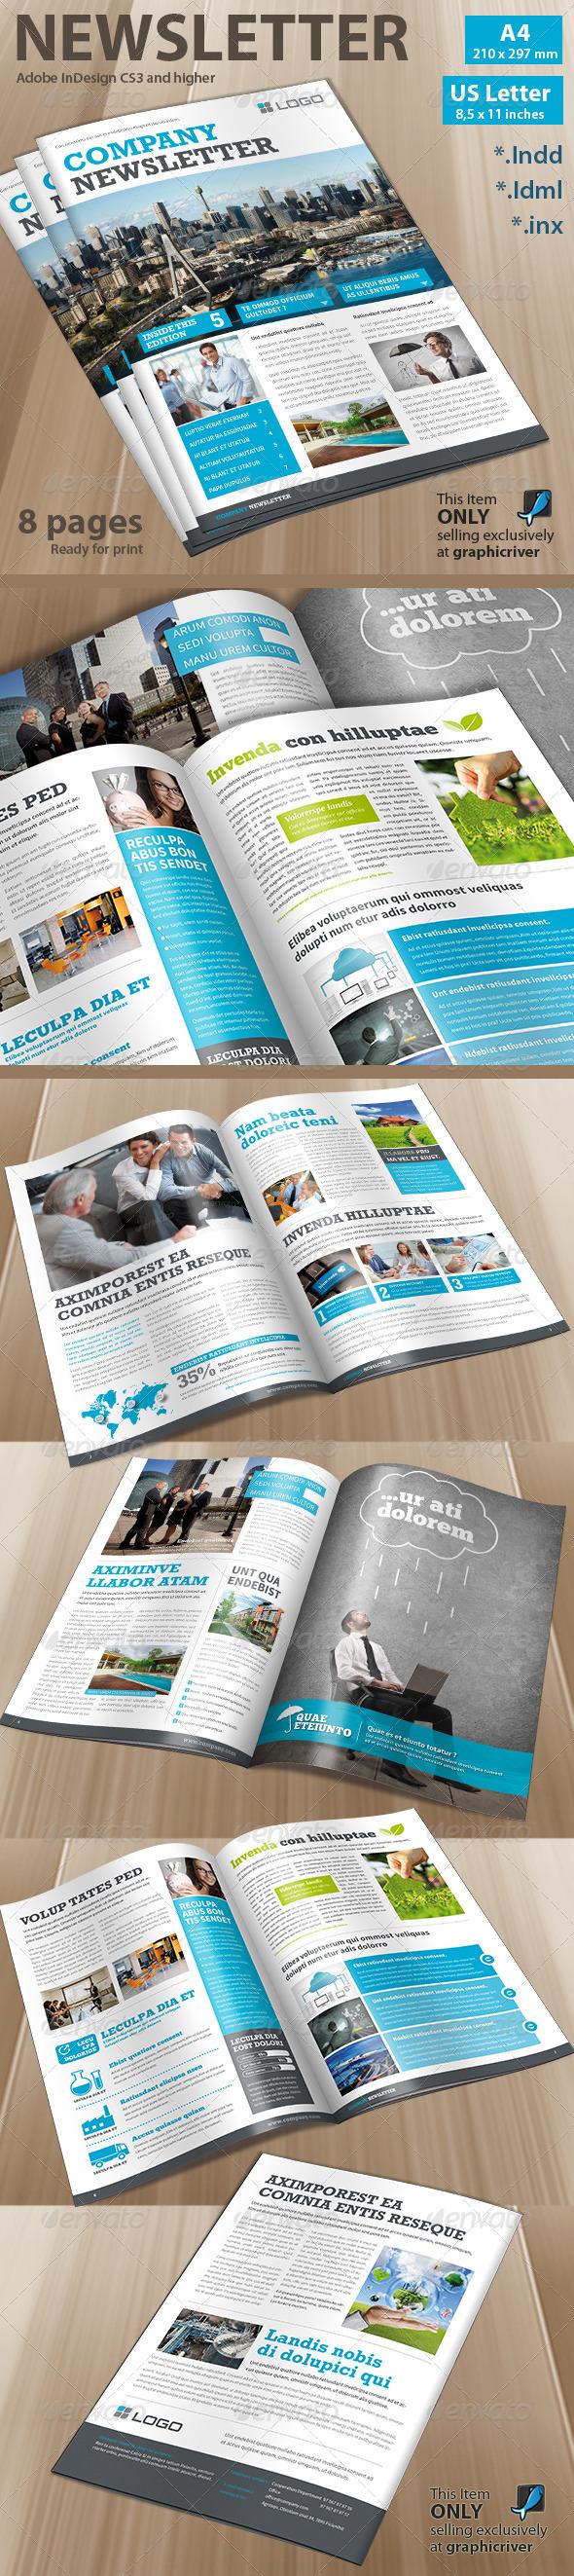 Newsletter Corporate - Newsletters Print Templates | newsletter ...